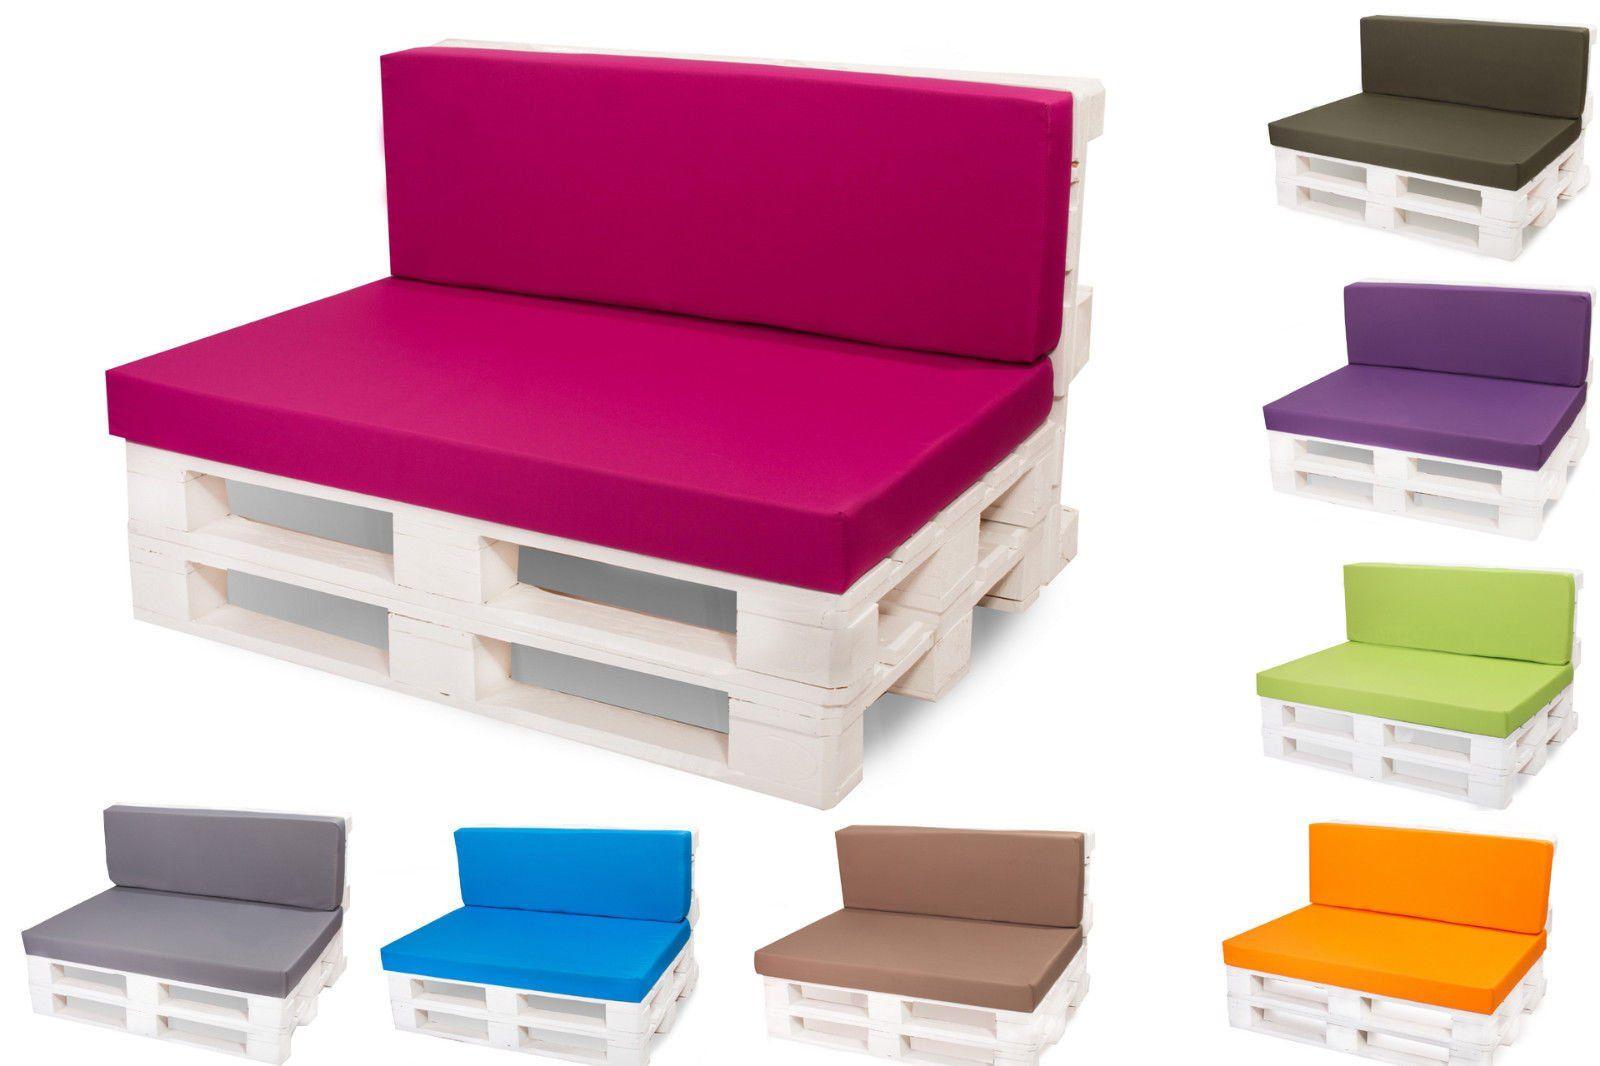 Pin By Setgarden Com On Fazer Vasos De Cimento In 2021 Pallet Cushions Pallet Furniture Pallet Furniture Outdoor